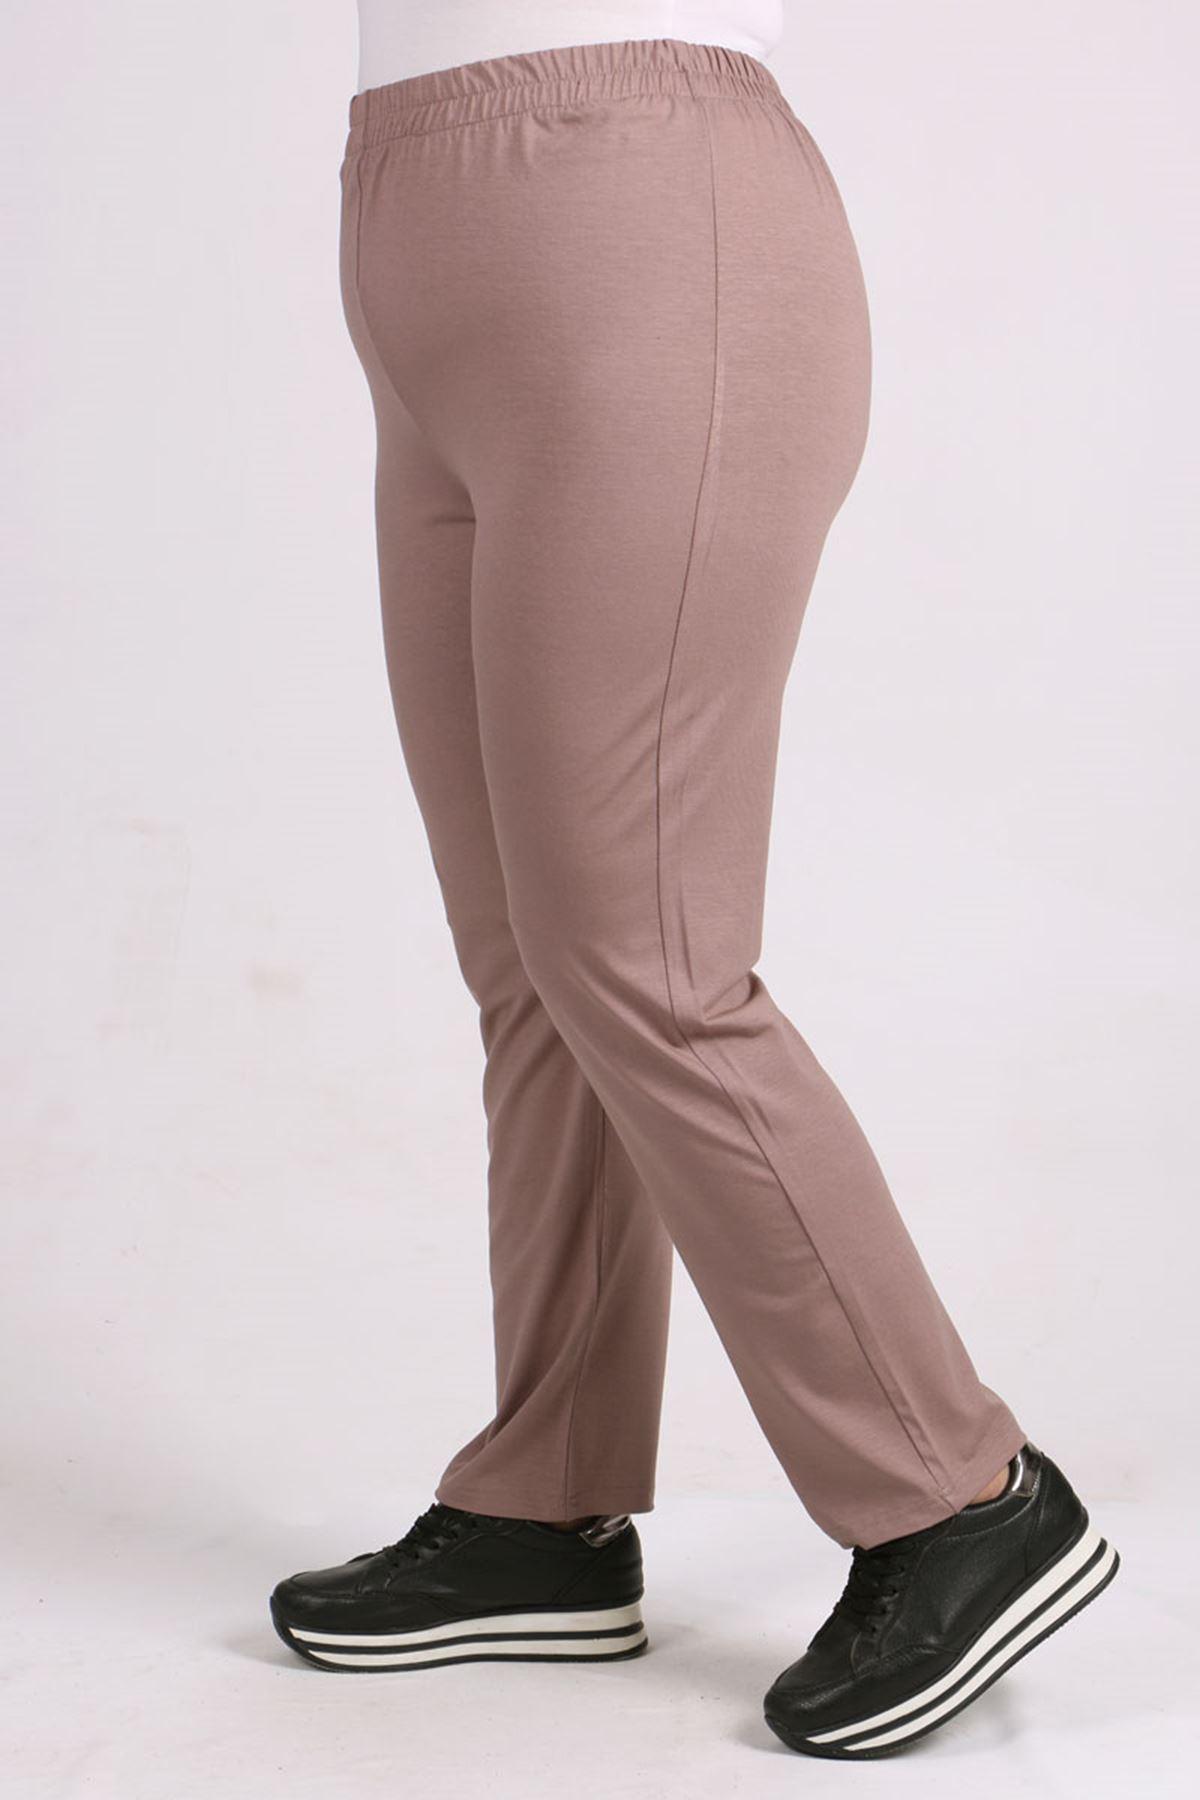 9057 Plus Size High Waist Elastic Pants - Mink